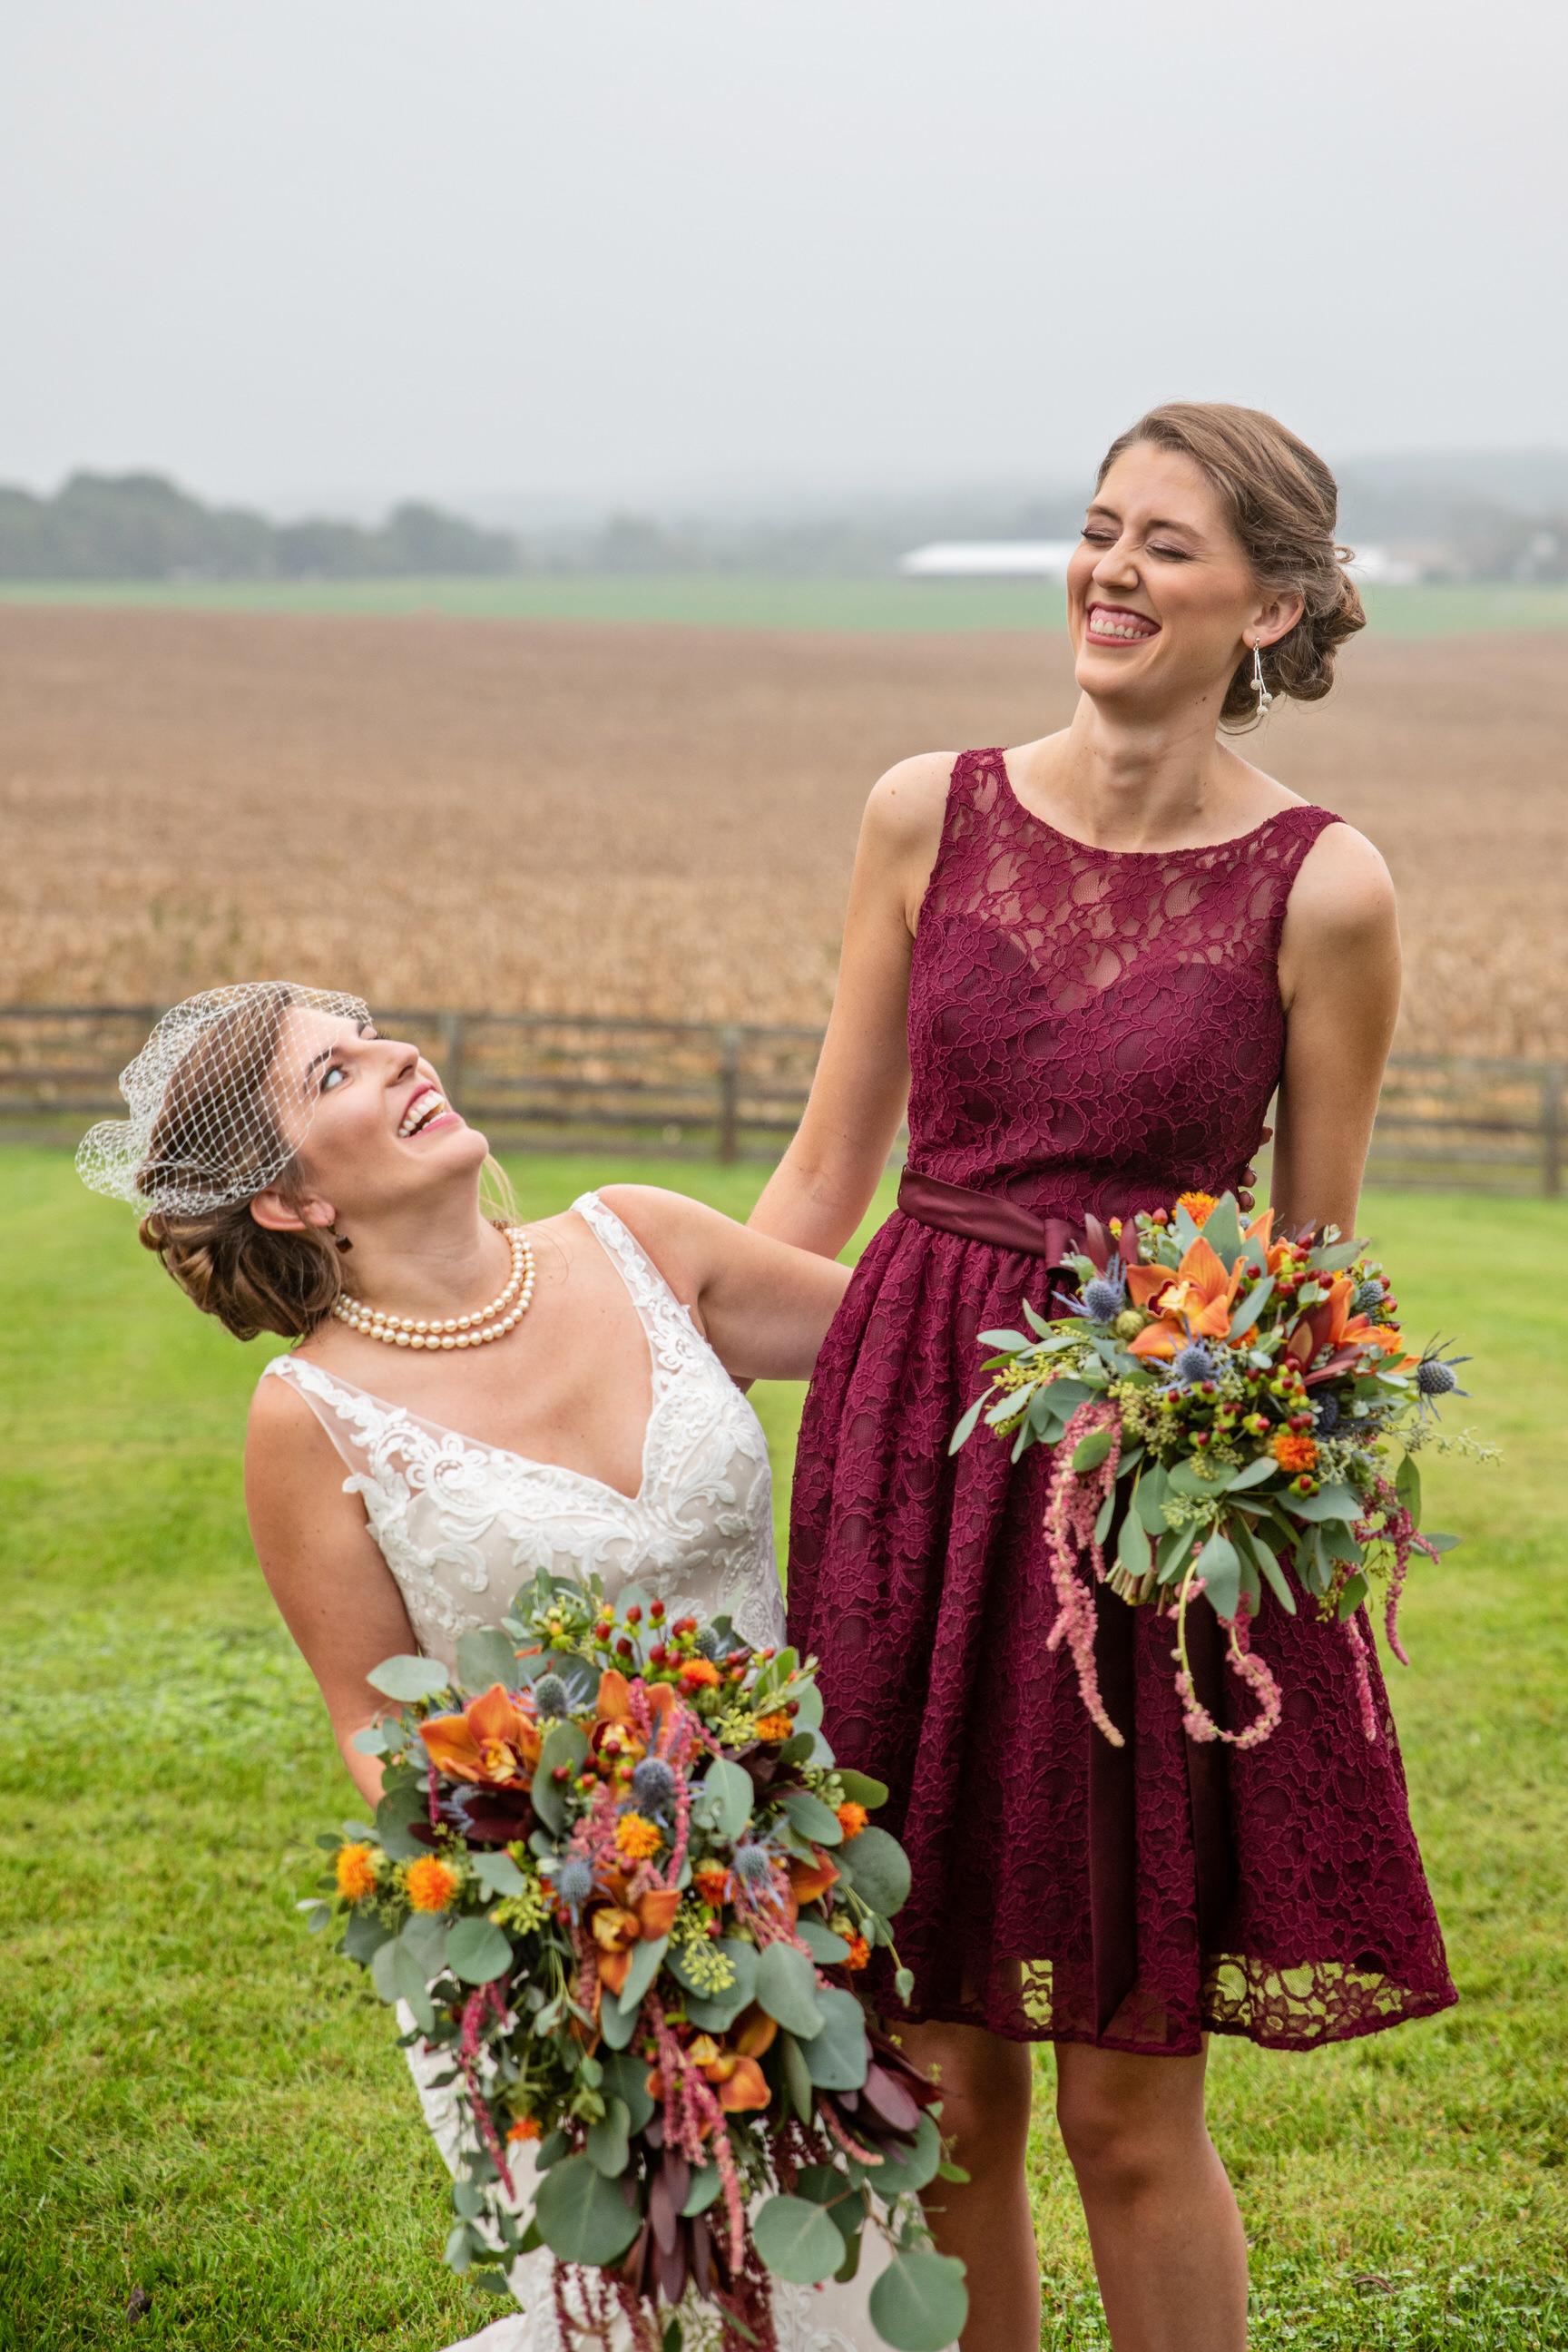 WalkersOverlookWedding-Angela&Ben-WeddingParty-9.jpg